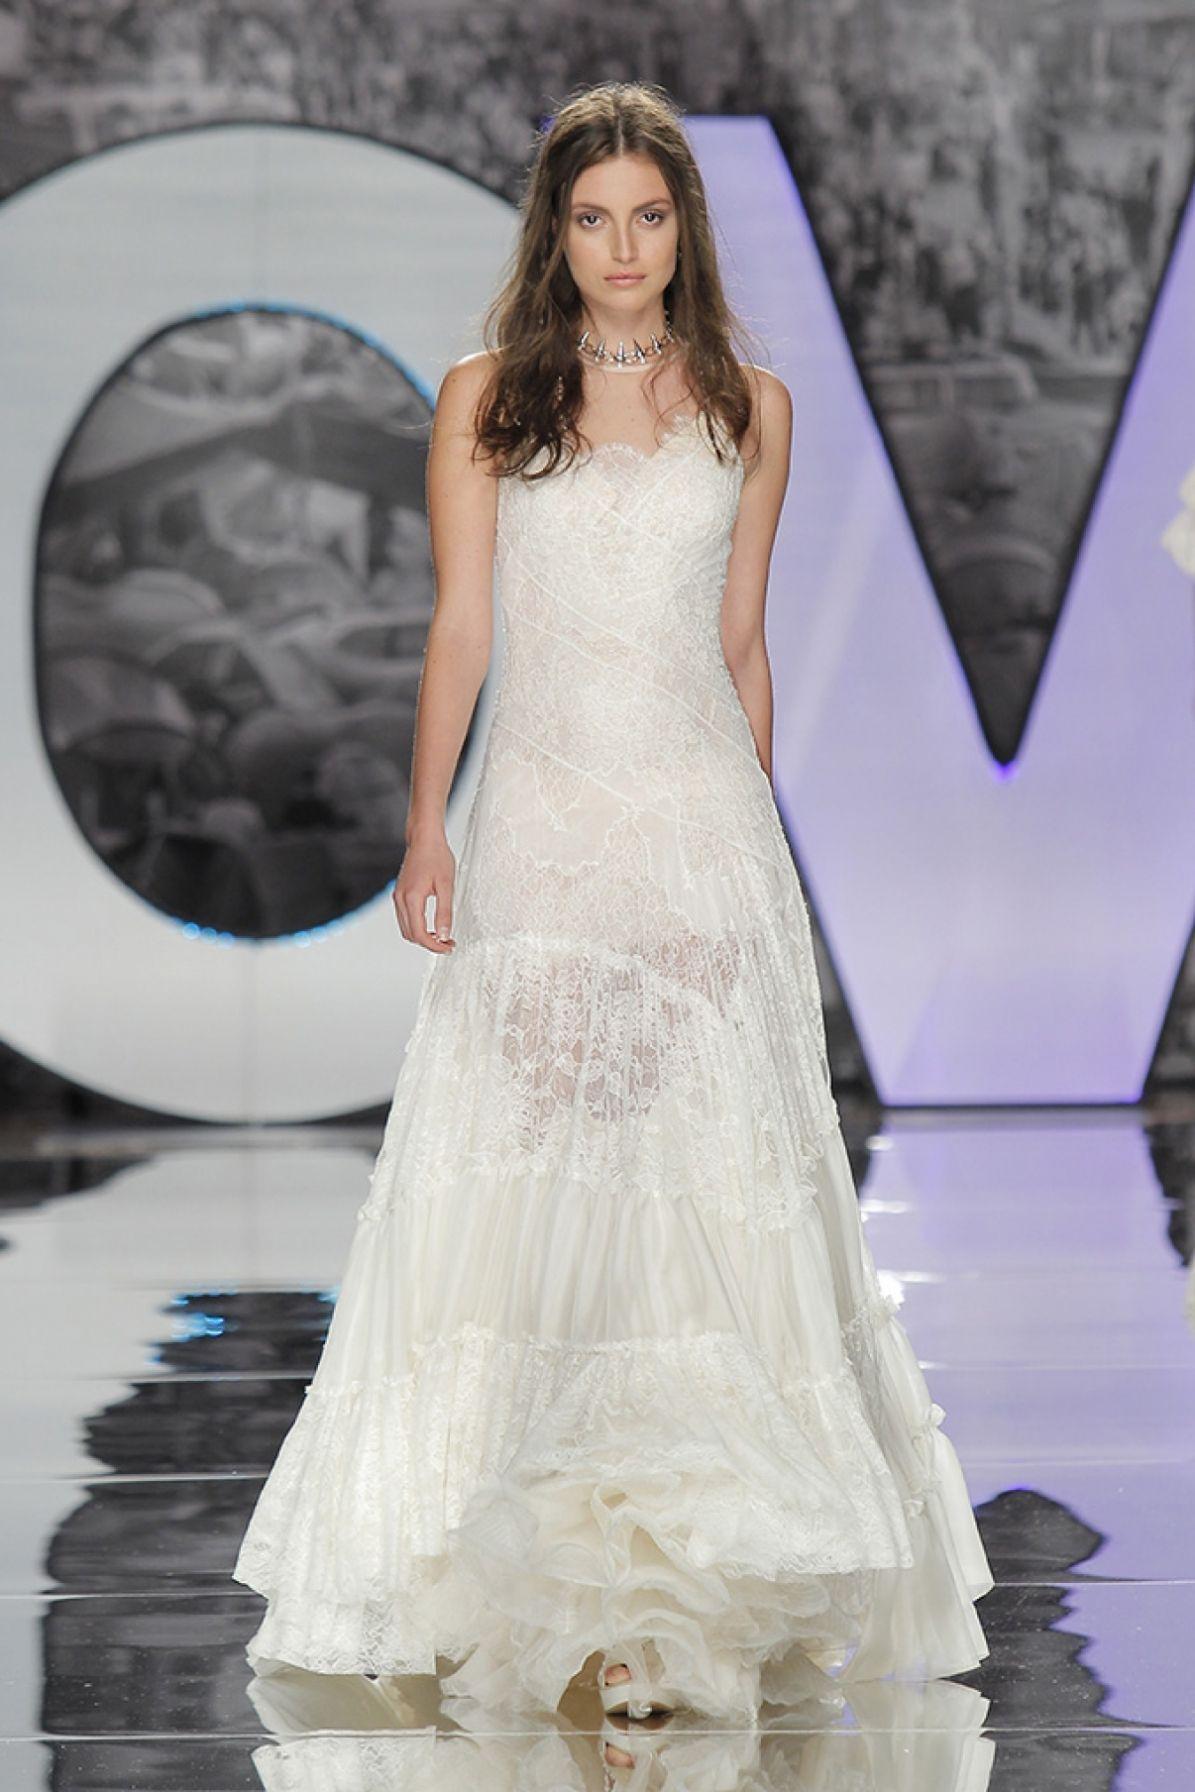 Encina Boho Wedding Dresses Romantic Bride High Fashion Custom Made: Art Made Wedding Dresses At Reisefeber.org